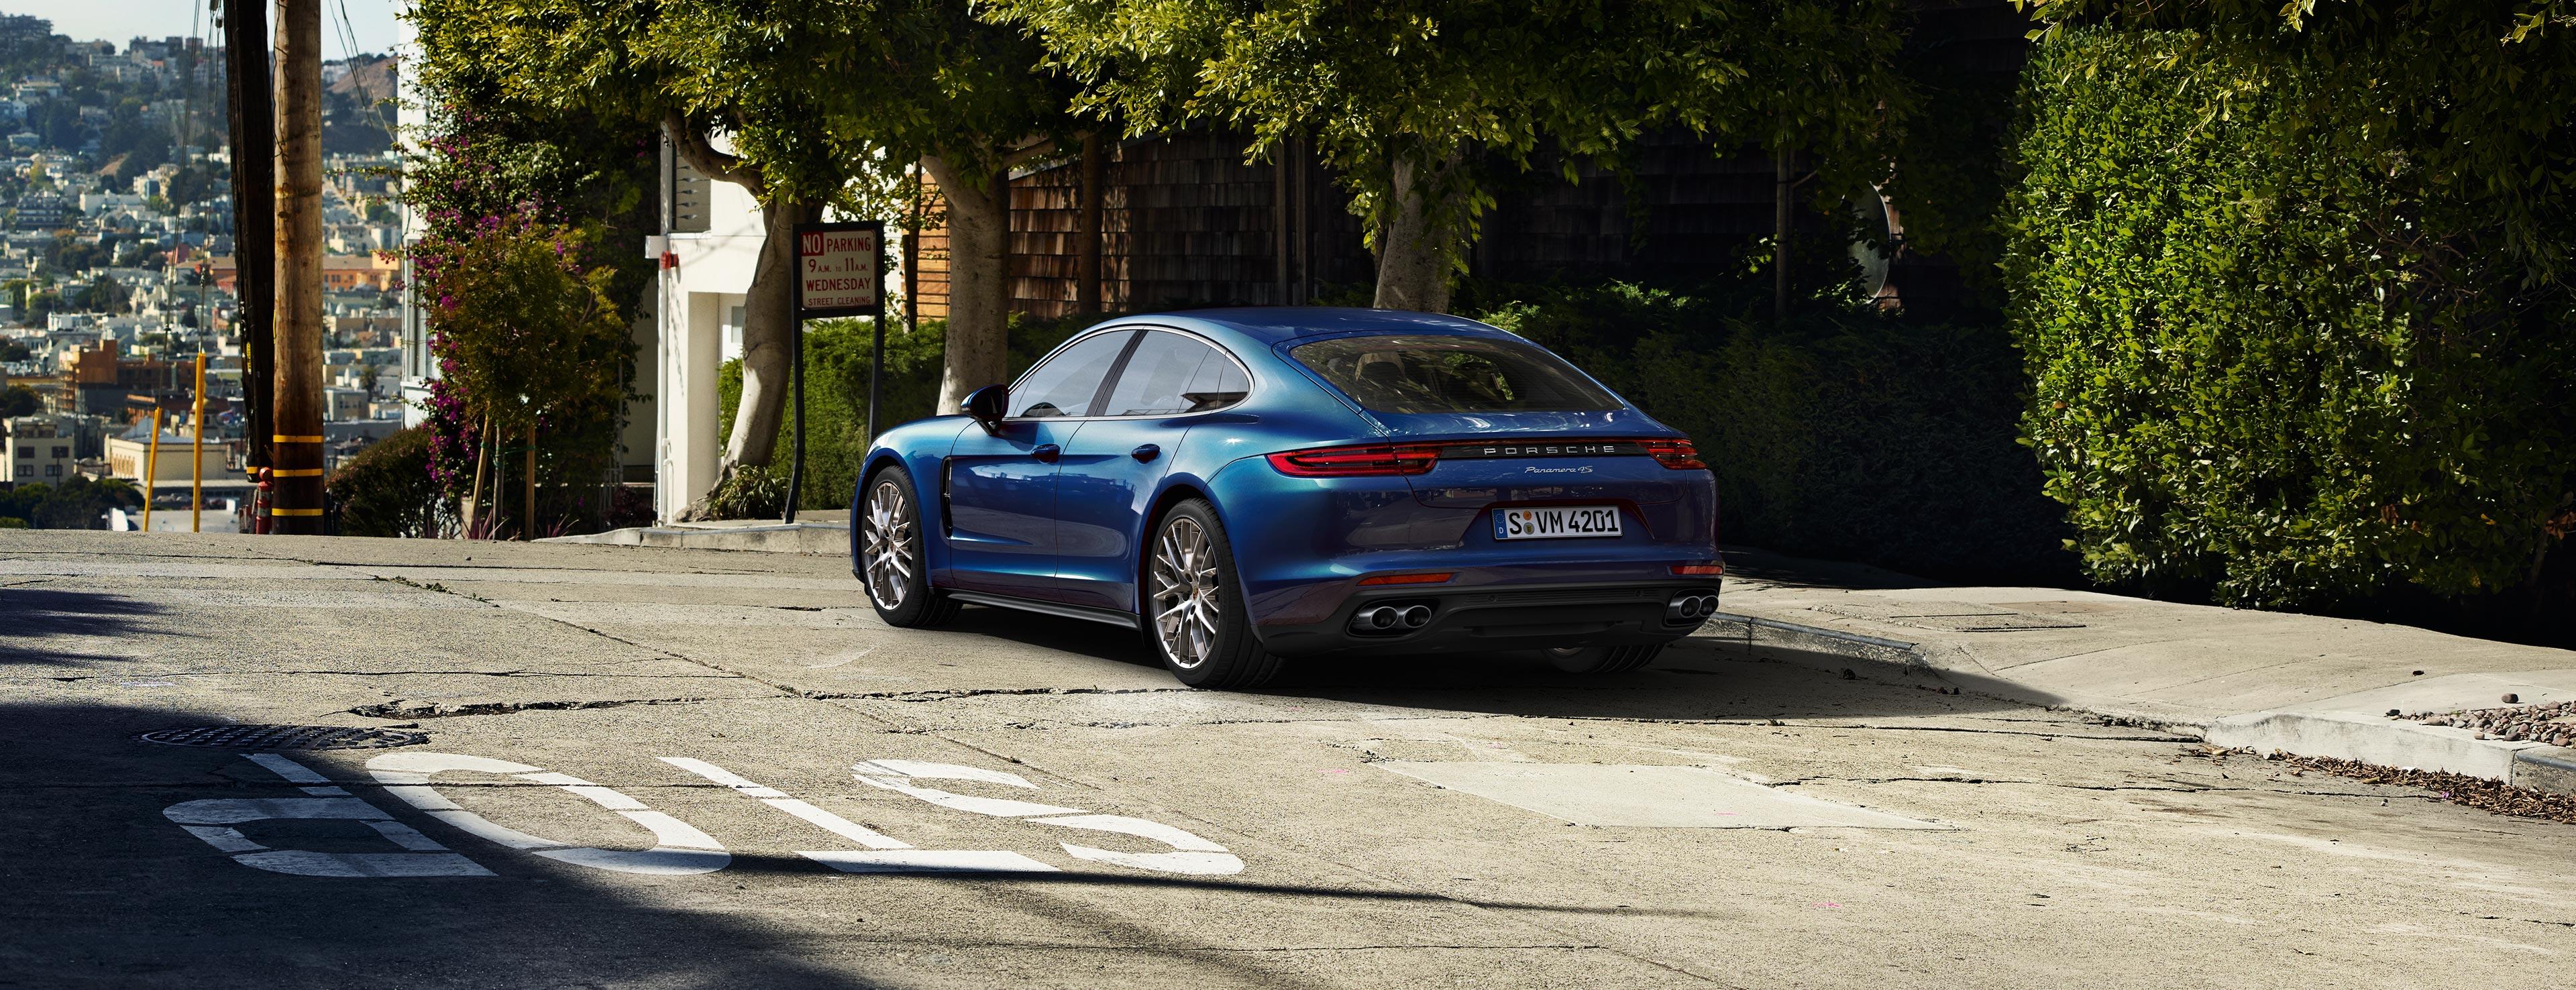 Porsche Panamera Models Porsche Usa